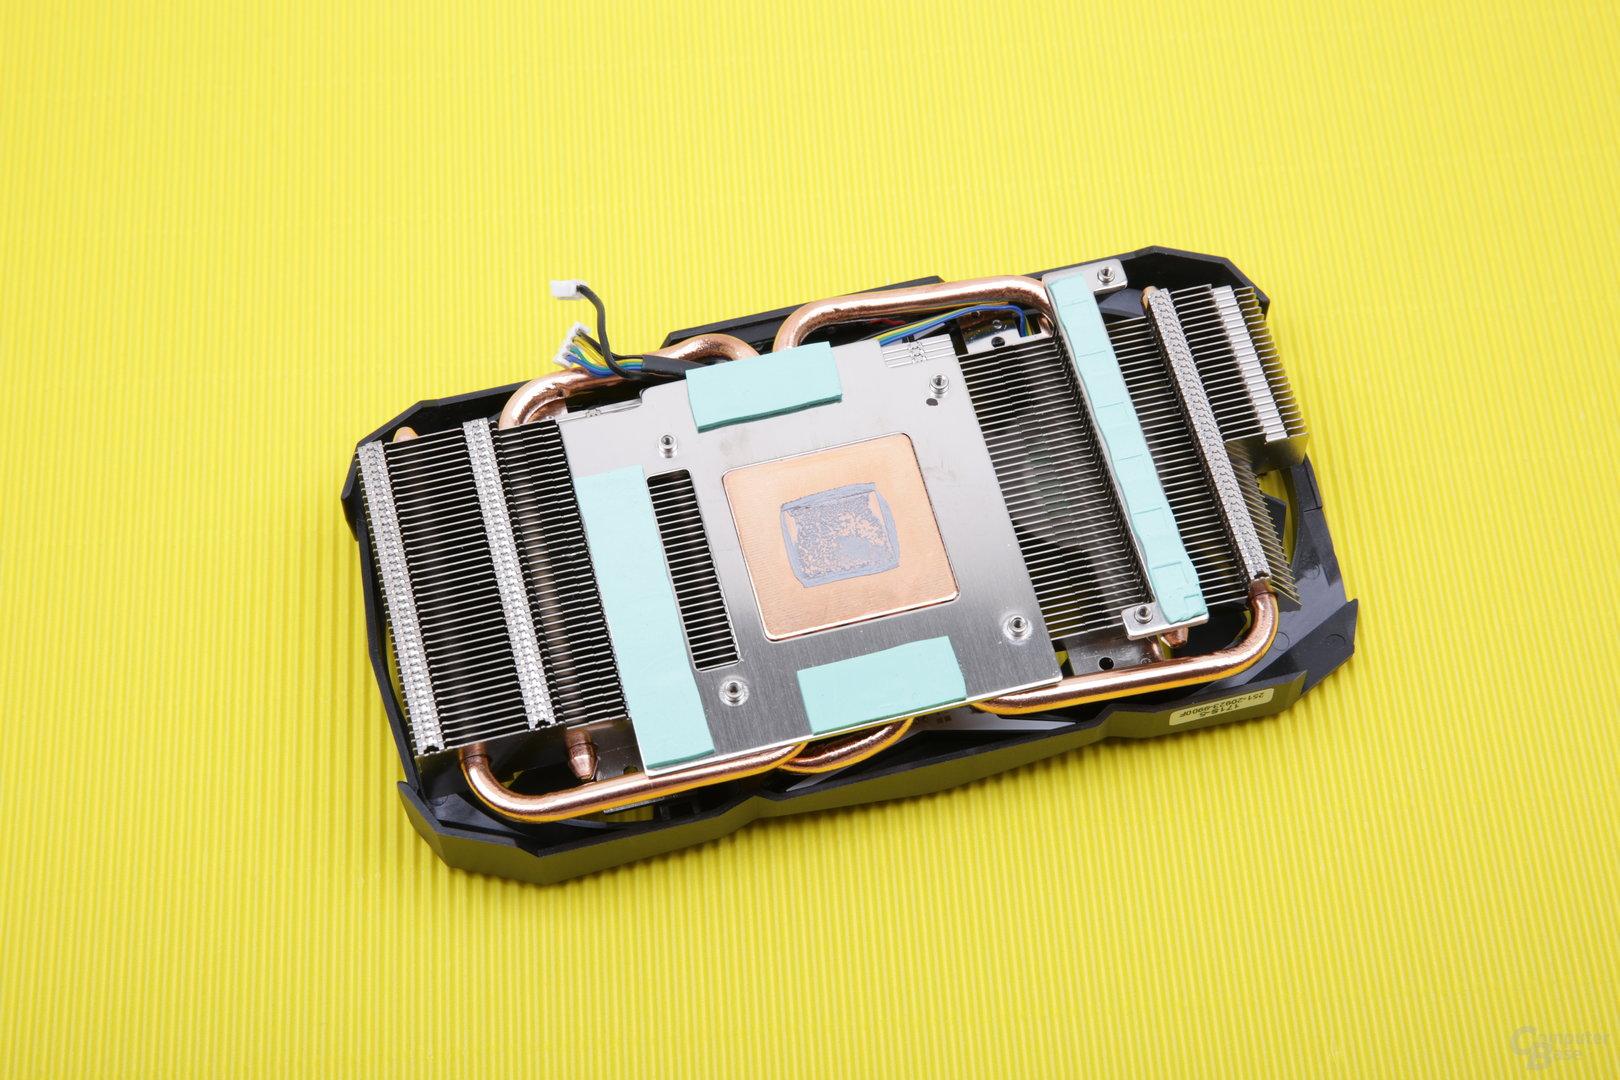 Zotac GeForce GTX 1080 Mini – Kühlerrückseite